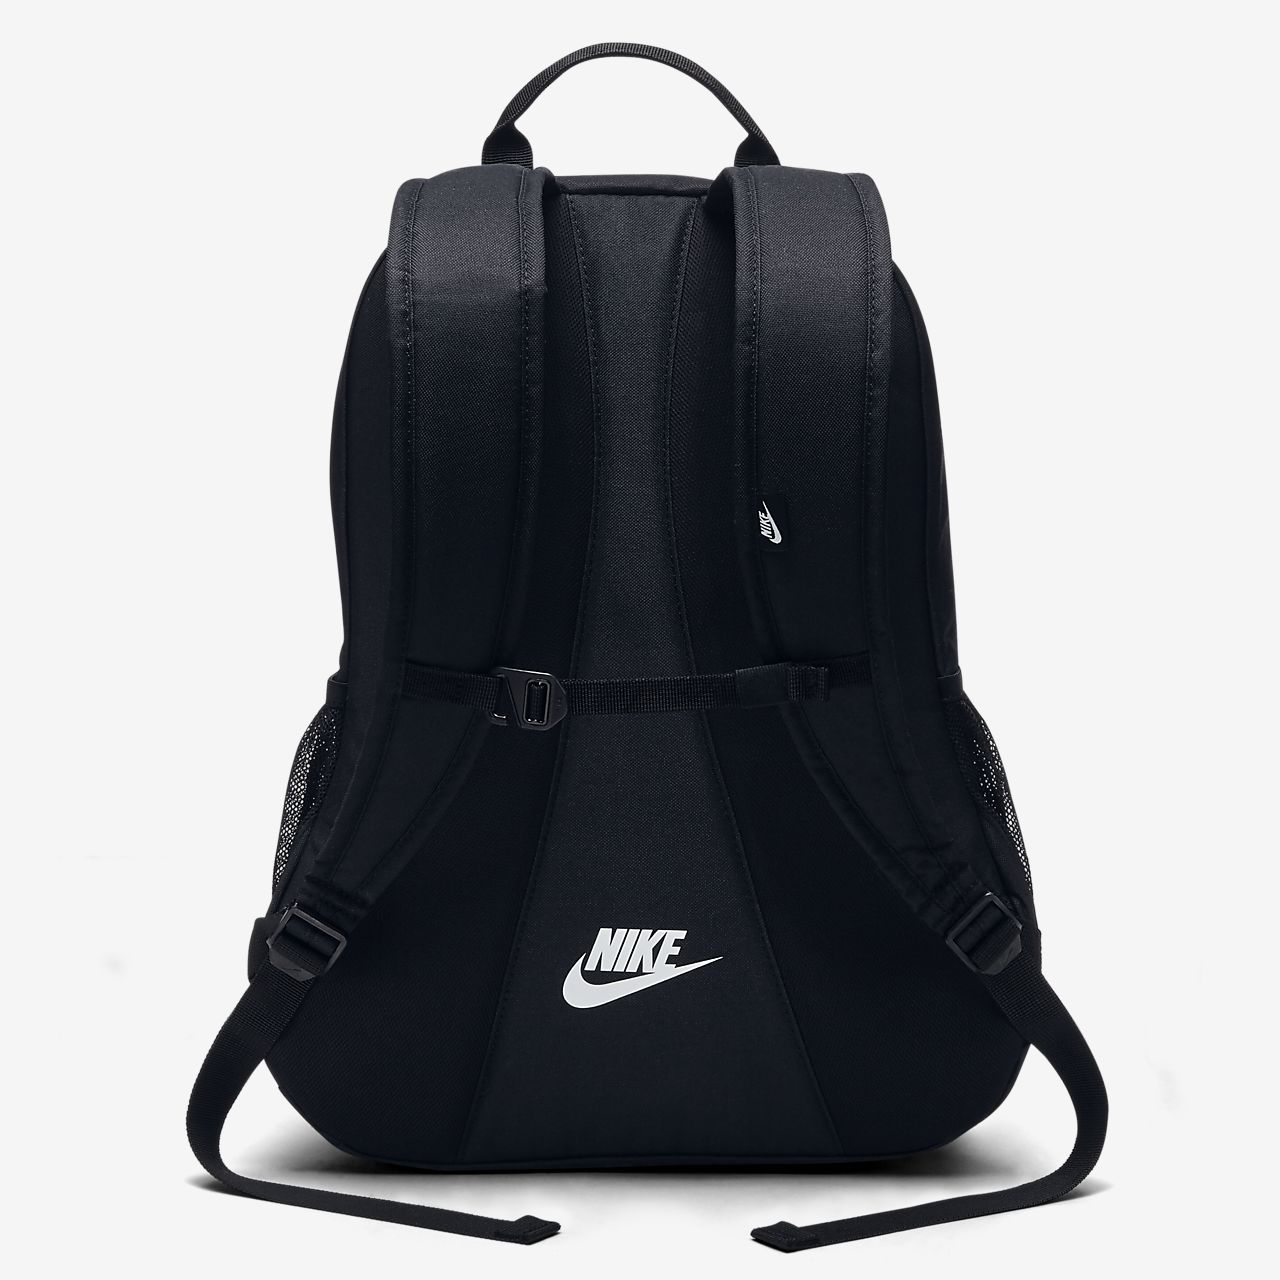 6c0b5661808b Nike Sportswear Hayward Futura 2.0 Backpack. Nike.com PT